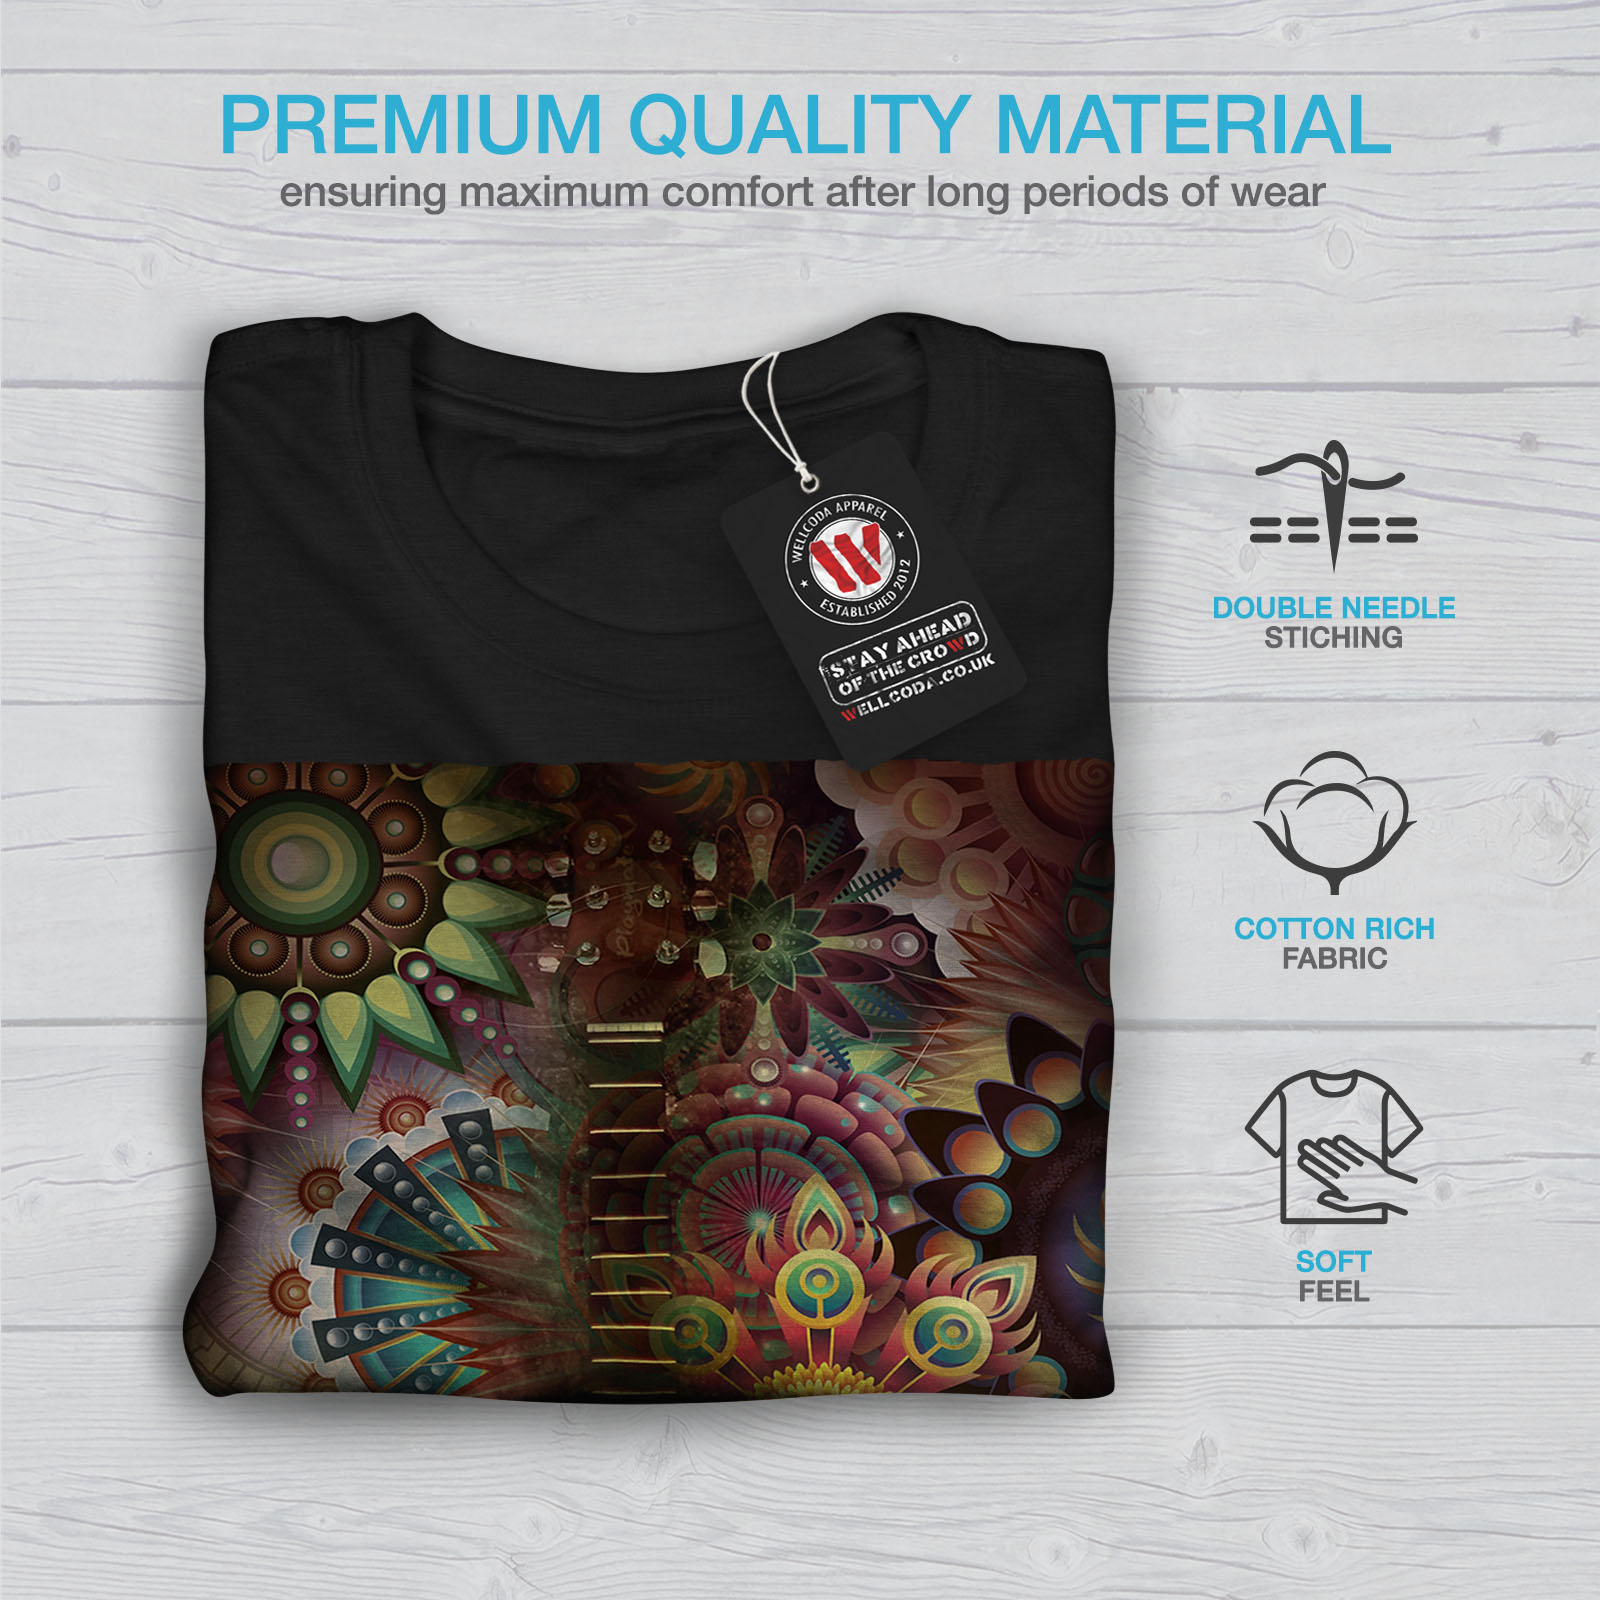 Wellcoda-Colorful-Guitar-Mens-T-shirt-Music-Graphic-Design-Printed-Tee thumbnail 7